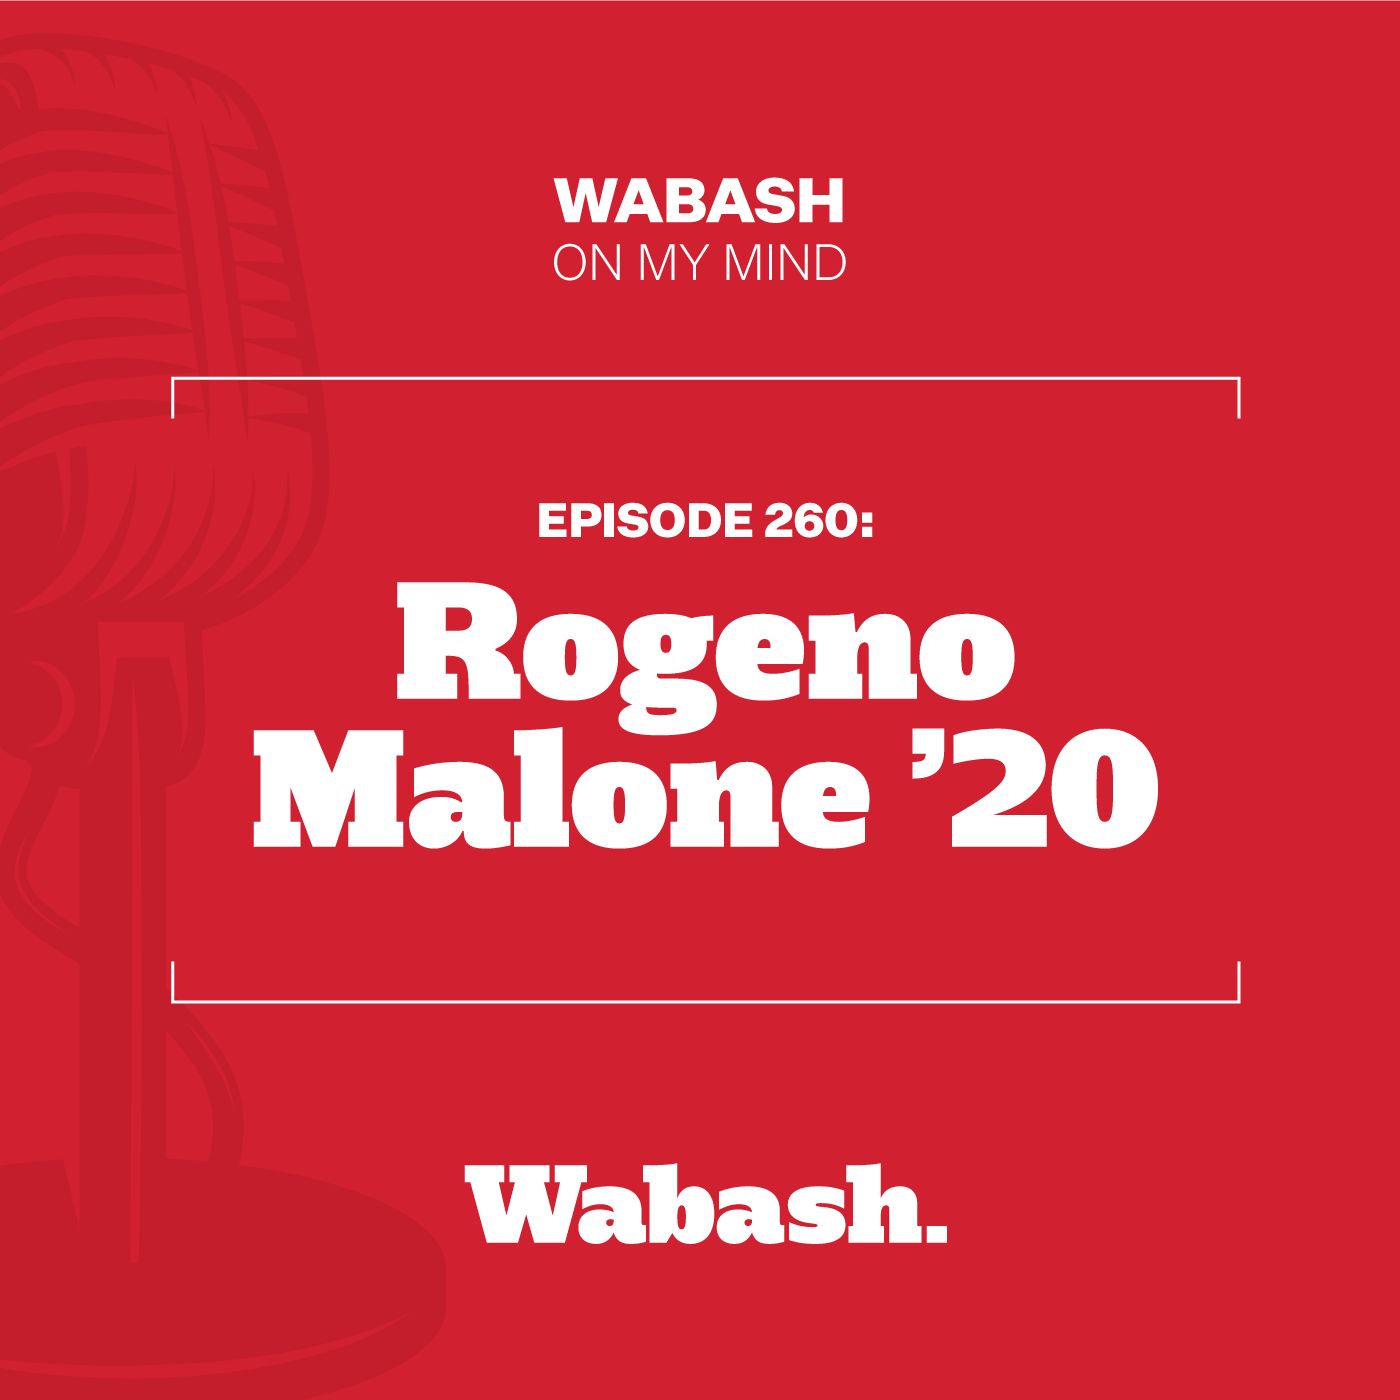 #260: Rogeno Malone '20